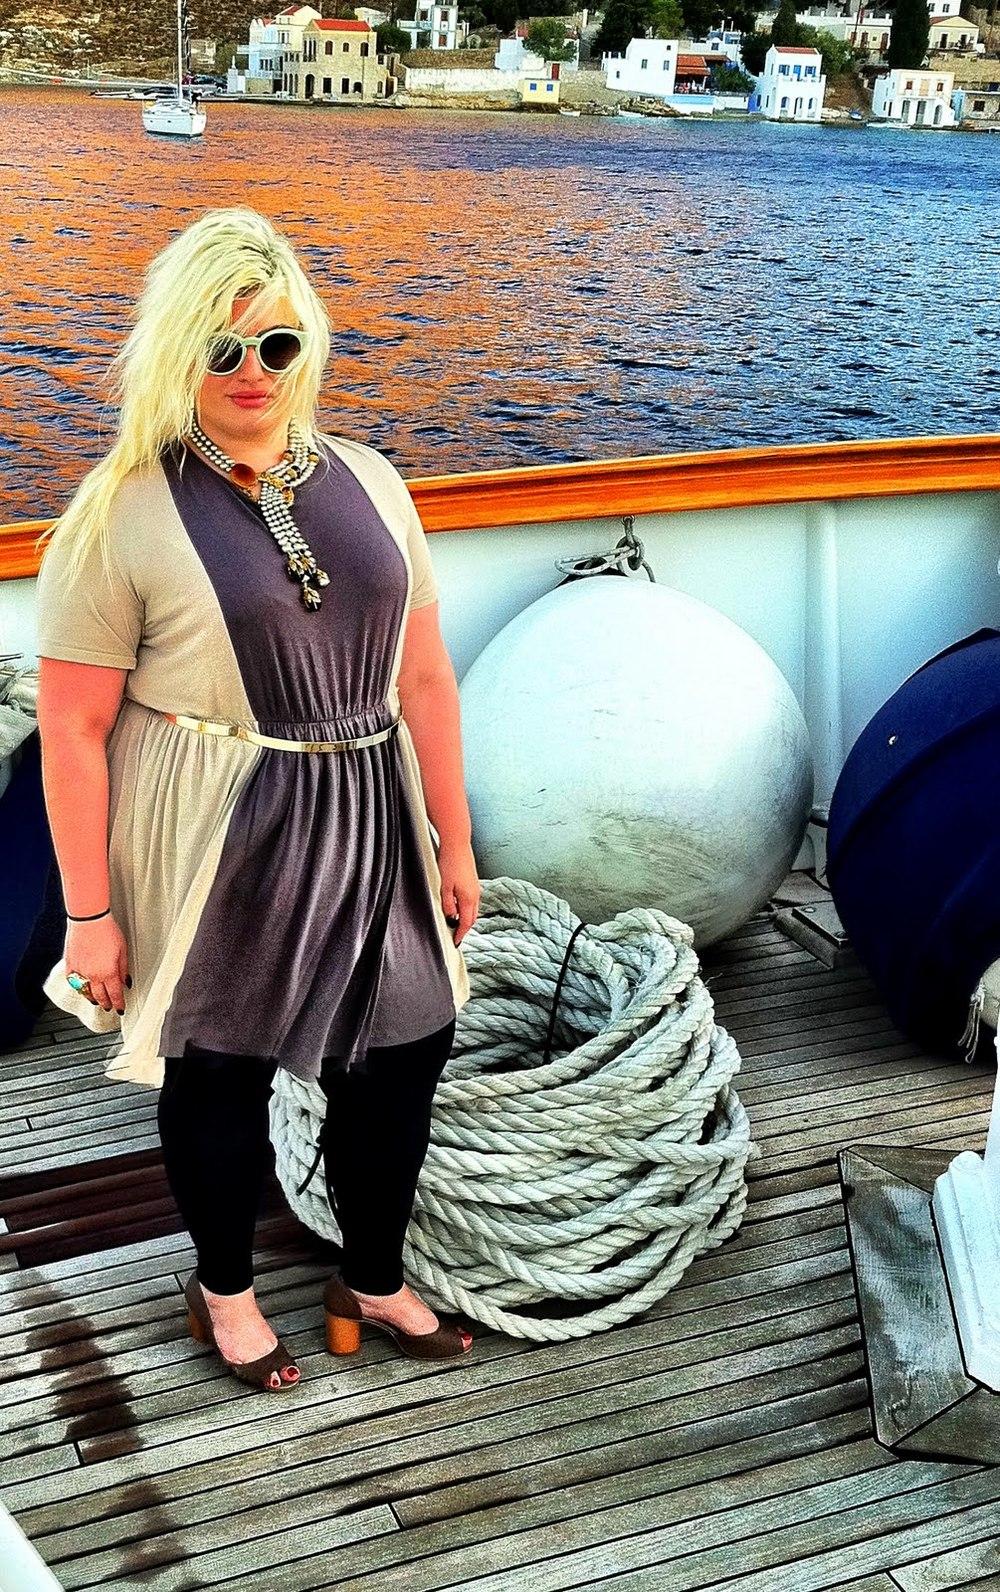 coco curvy, the jersey dress, jersey dress, coco limberakis, coco curvy blog, curvy blogger, fatshion, plus size, plus size bloggers, chloe, metallic belt, stella mccartney sunglasses, curvy coco